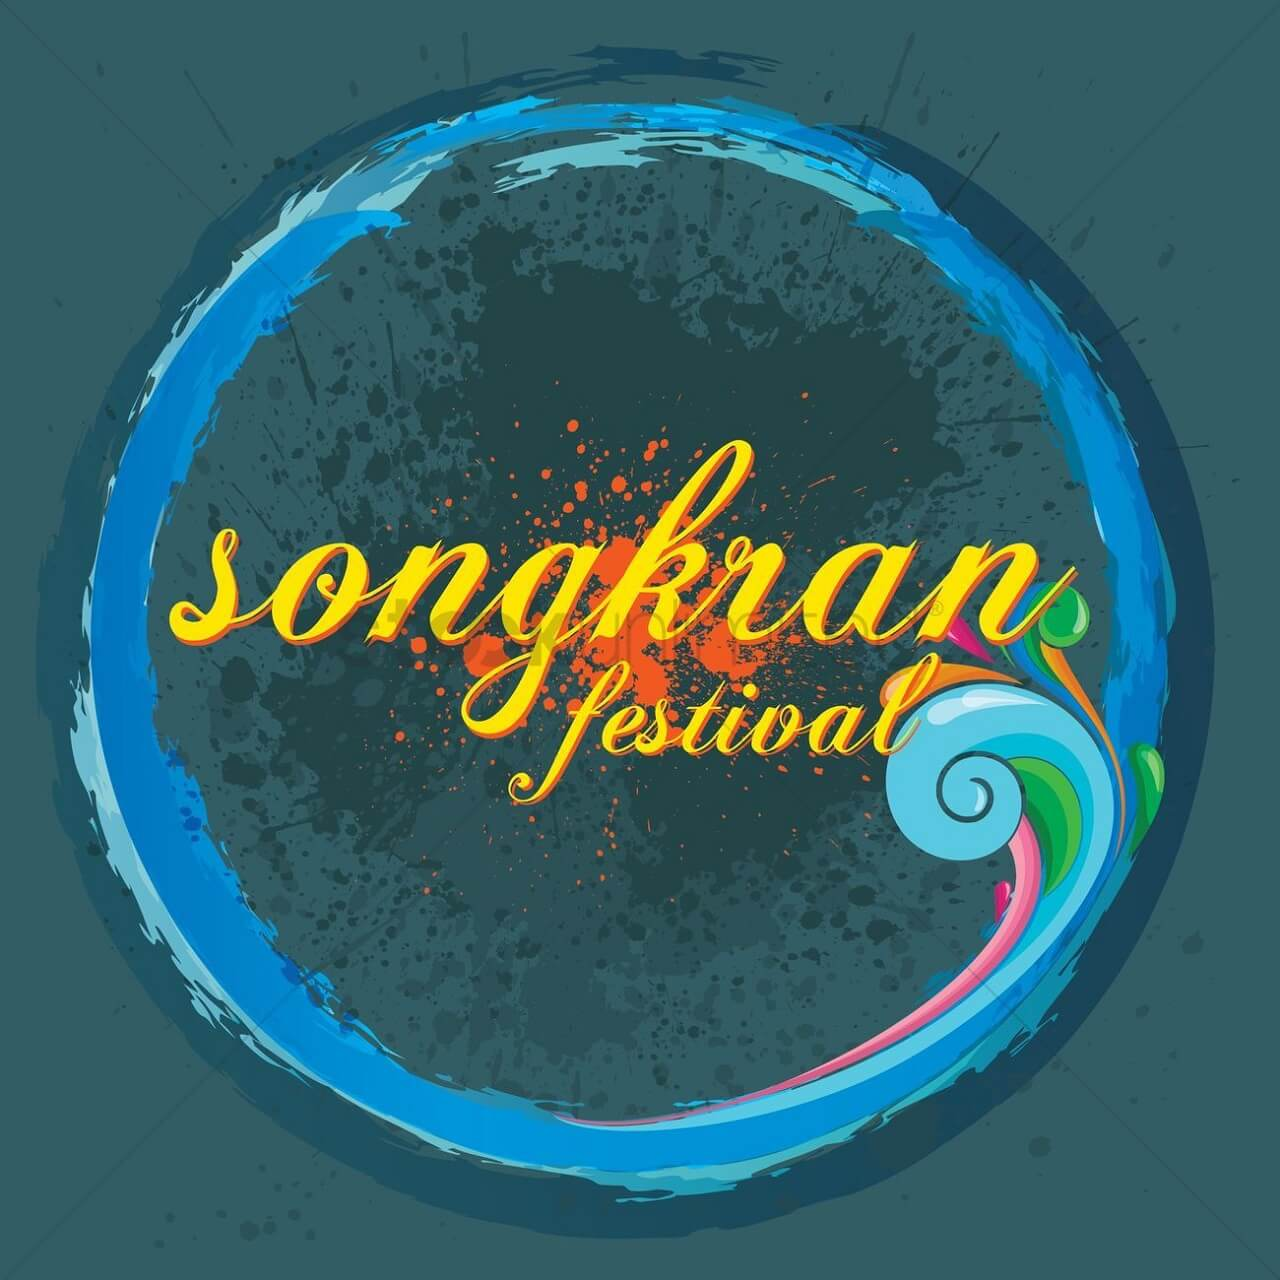 Songkran festival wallpapers for WhatsApp 1280x1280px